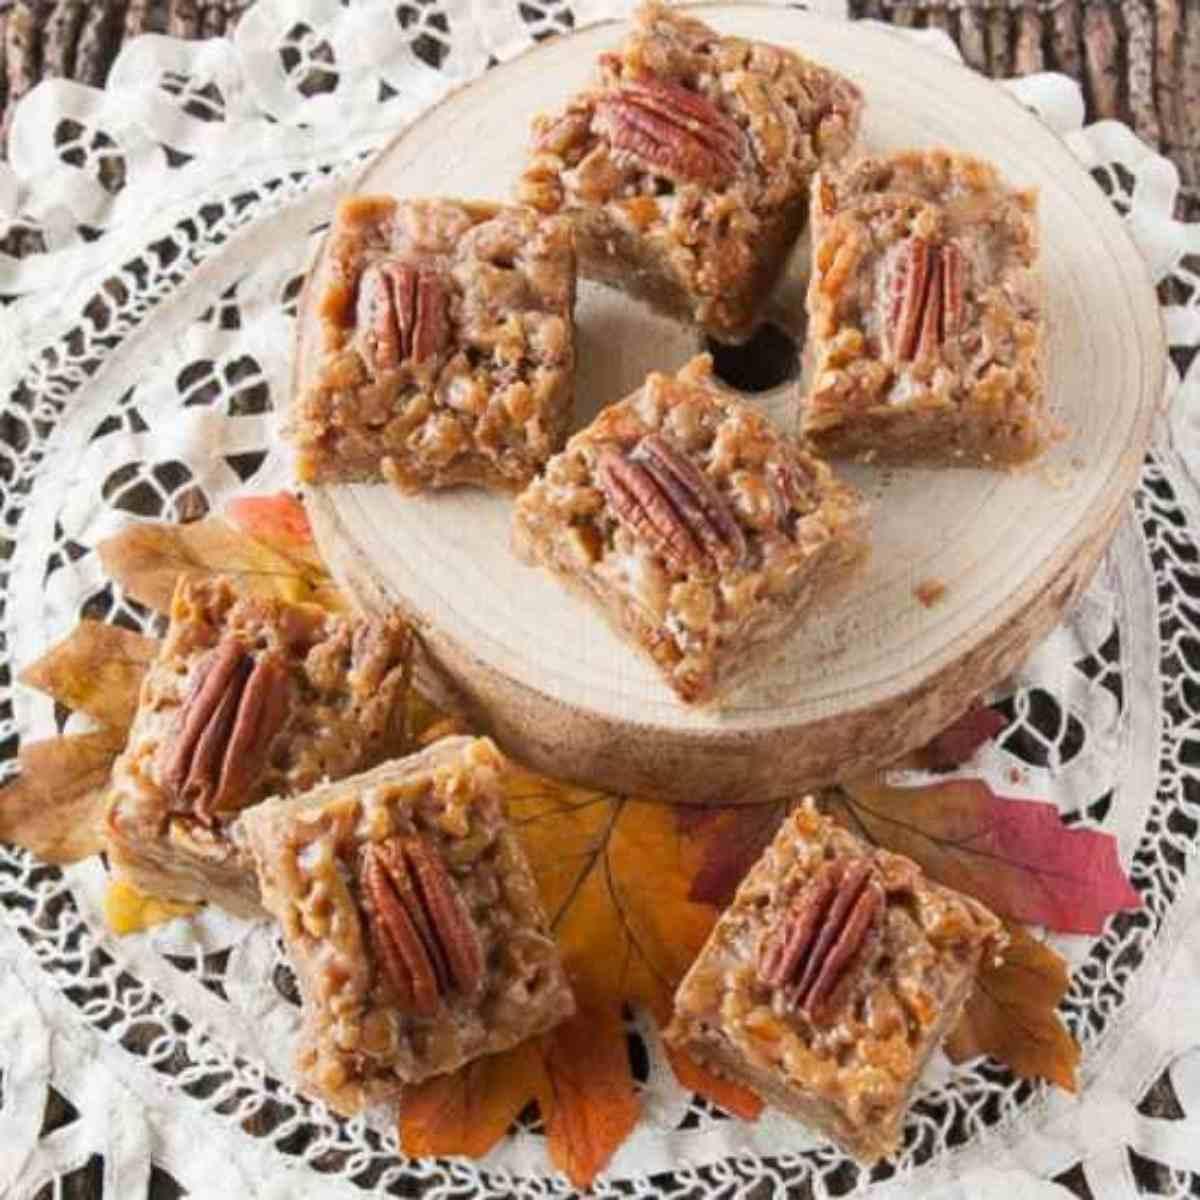 Pecan pie bars on a doily.